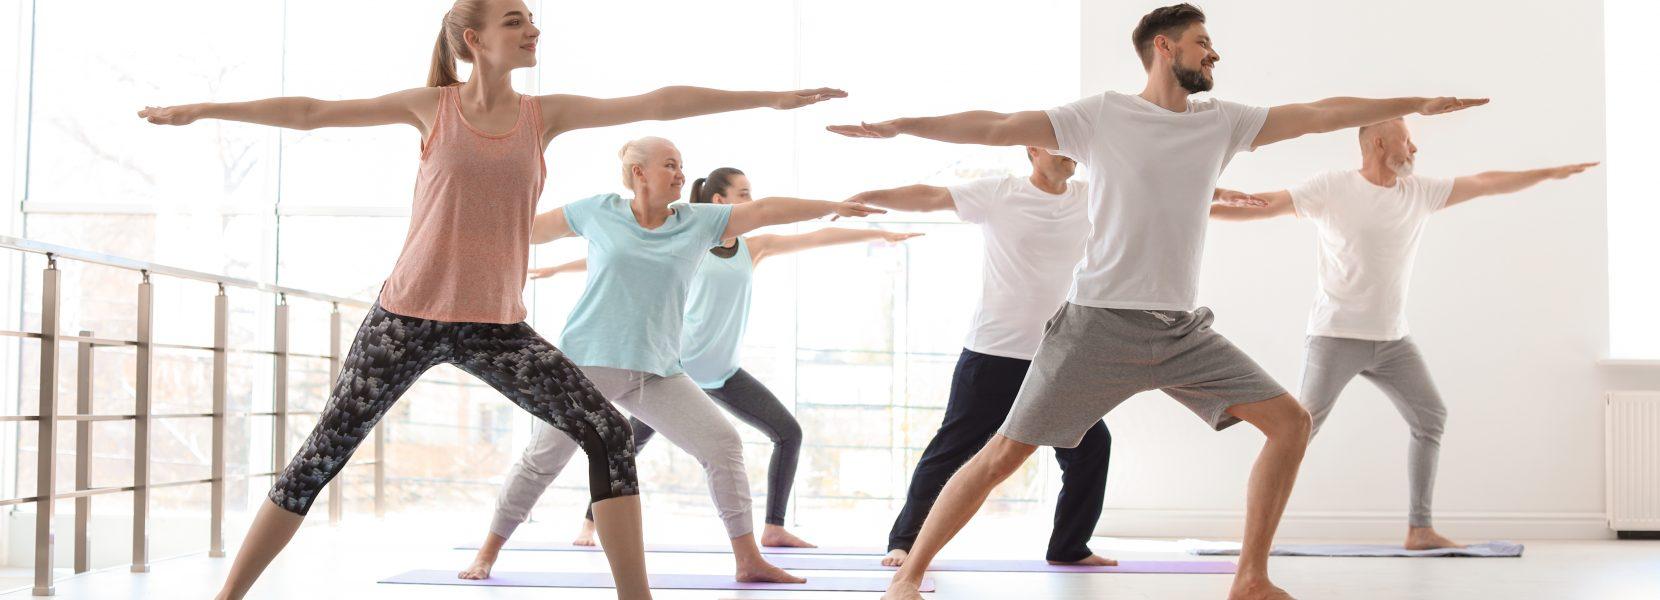 Yoga & Strömen: Yoga tut allen gut